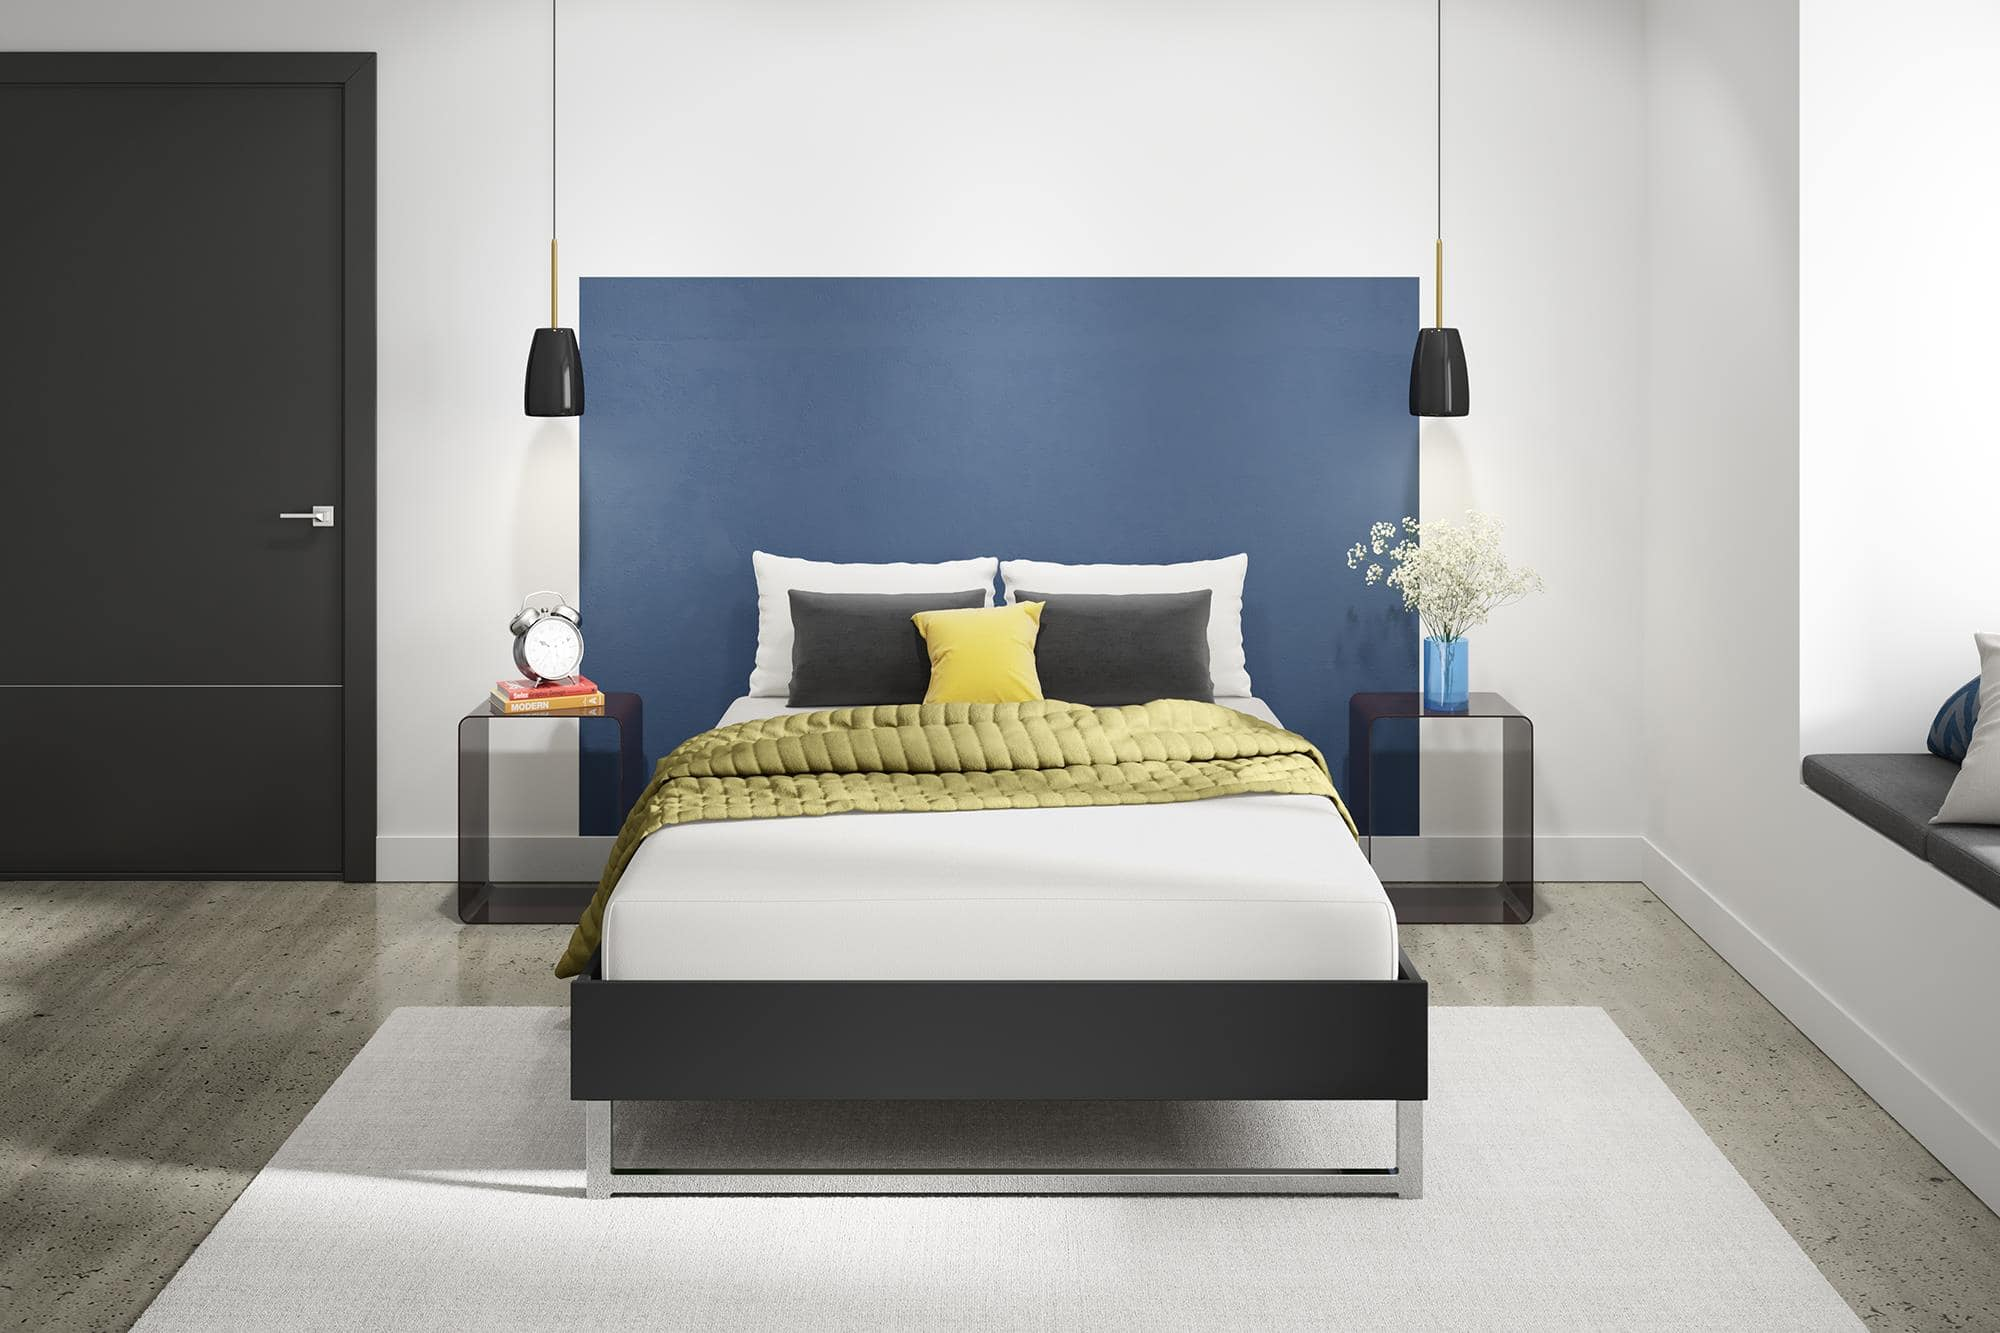 Amazon 8 Signature Sleep Memory Foam Mattress Queen 170 84